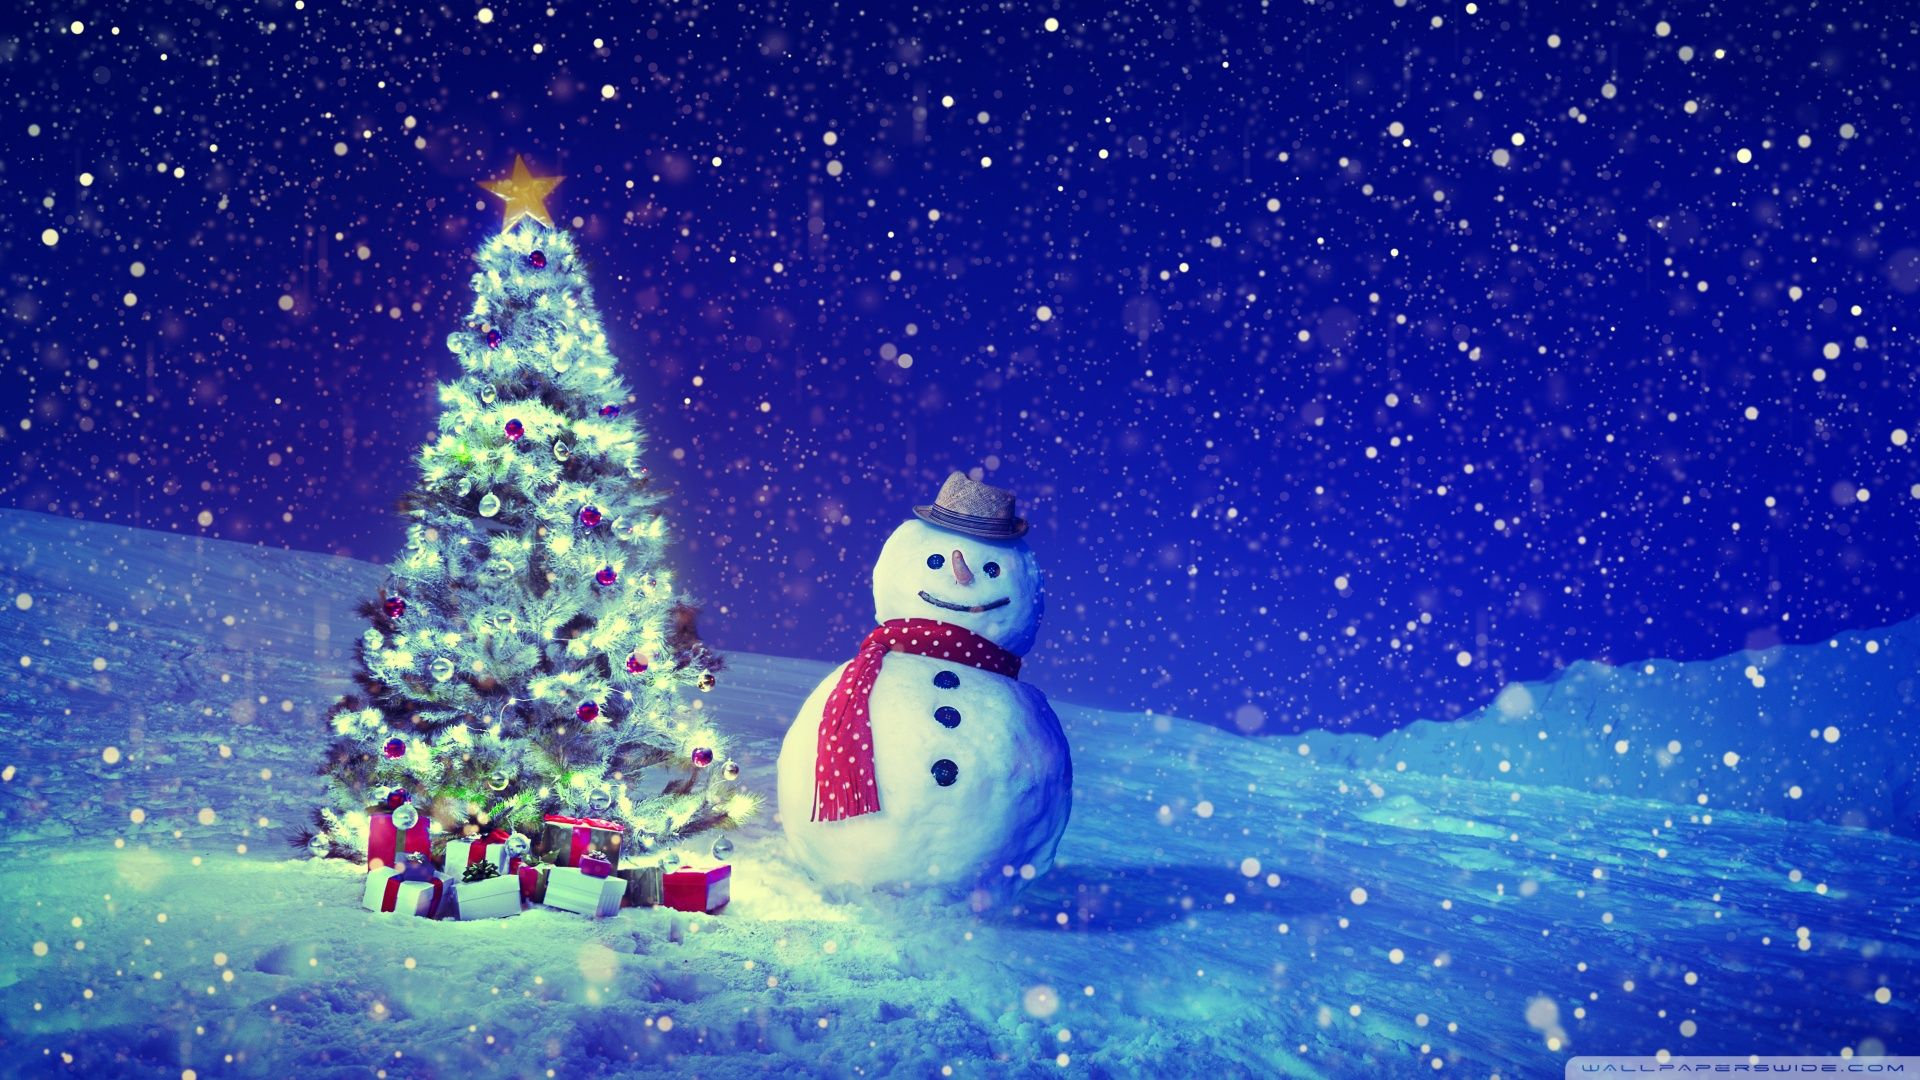 Winter Christmas Wallpapers Full Hd Flip Wallpapers Download Free Wallpaper Hd Christmas Wallpaper Christmas Landscape Christmas Wallpaper Backgrounds